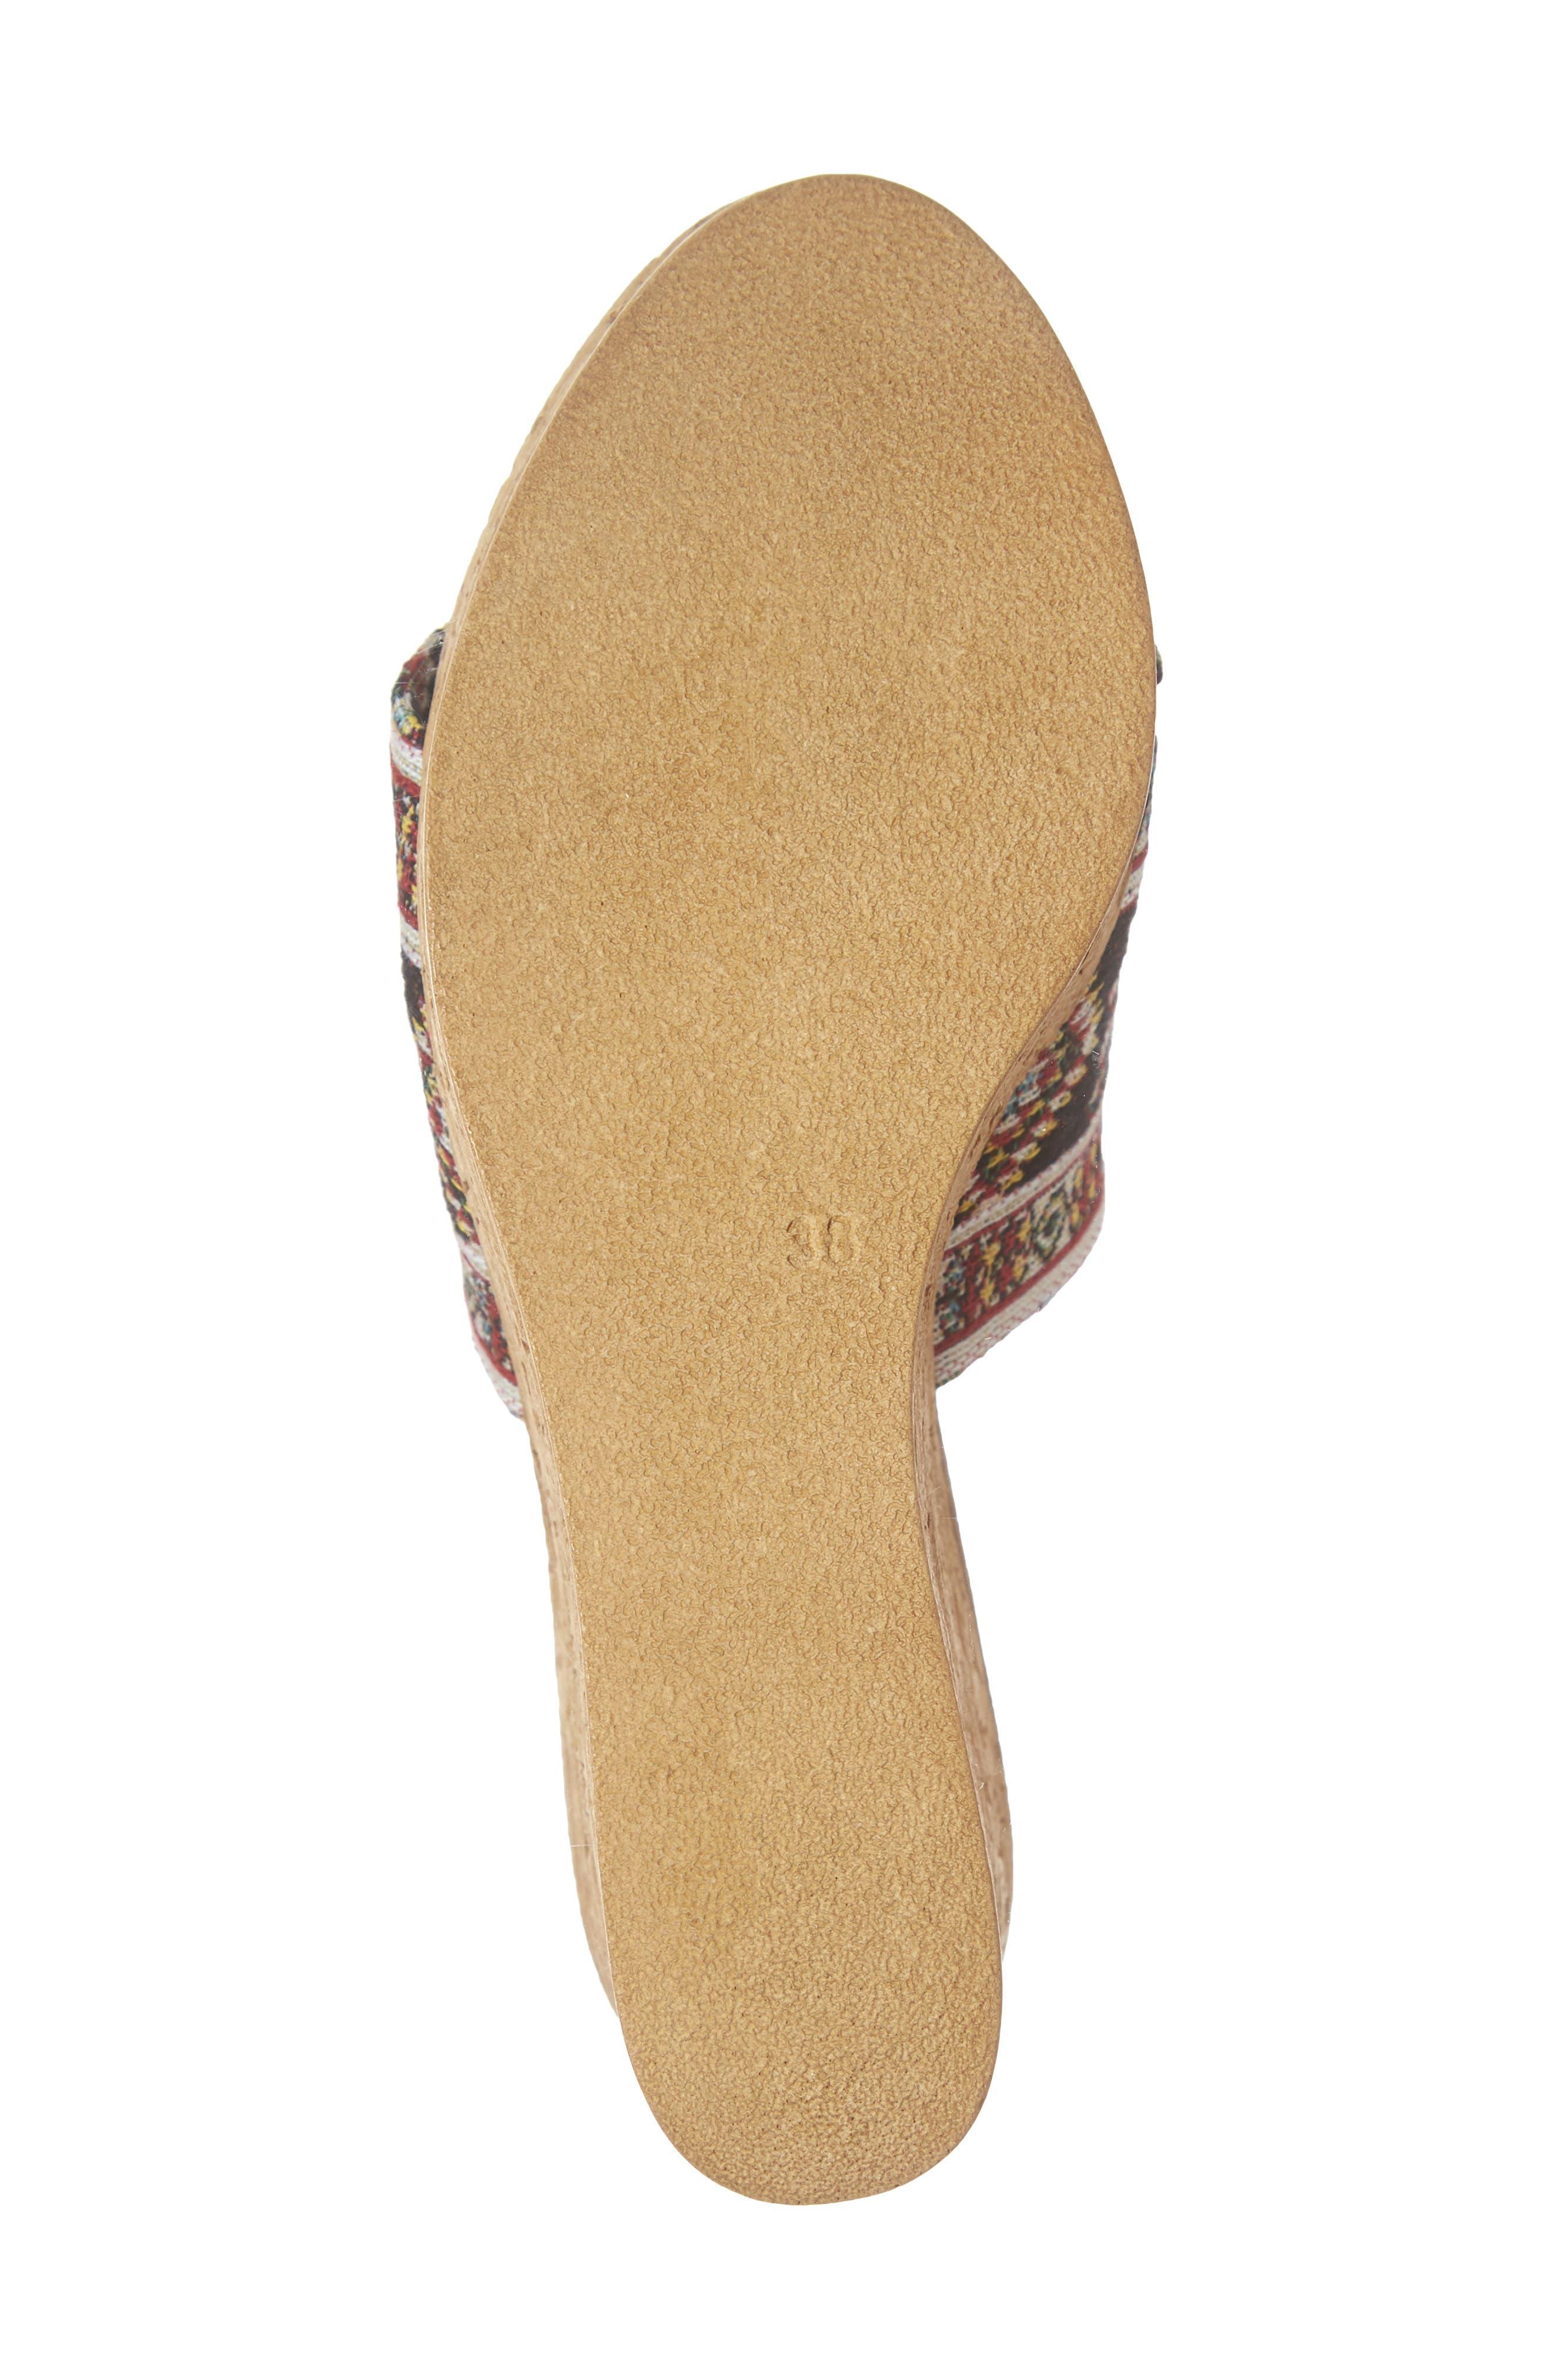 Orabela Platform Wedge Sandal,                             Alternate thumbnail 6, color,                             BLACK MULTICOLOR FABRIC